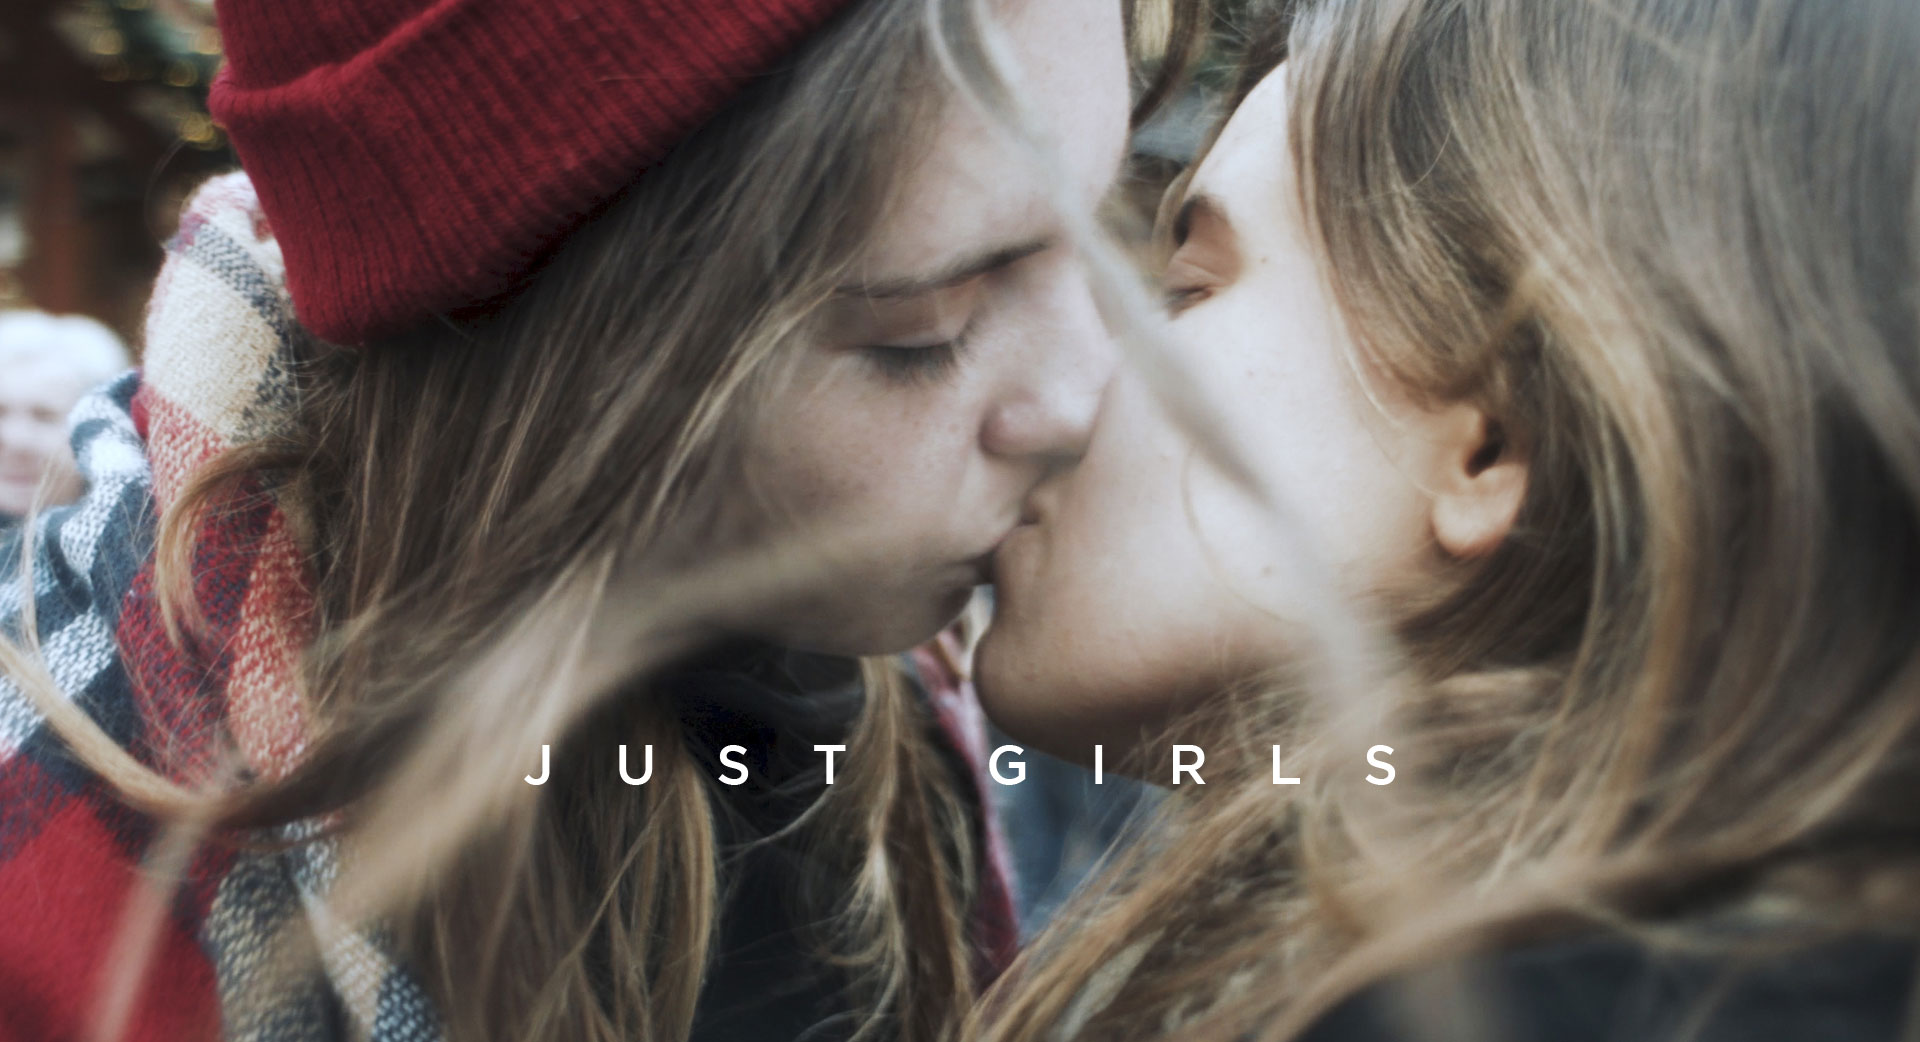 Just Girls (2020)